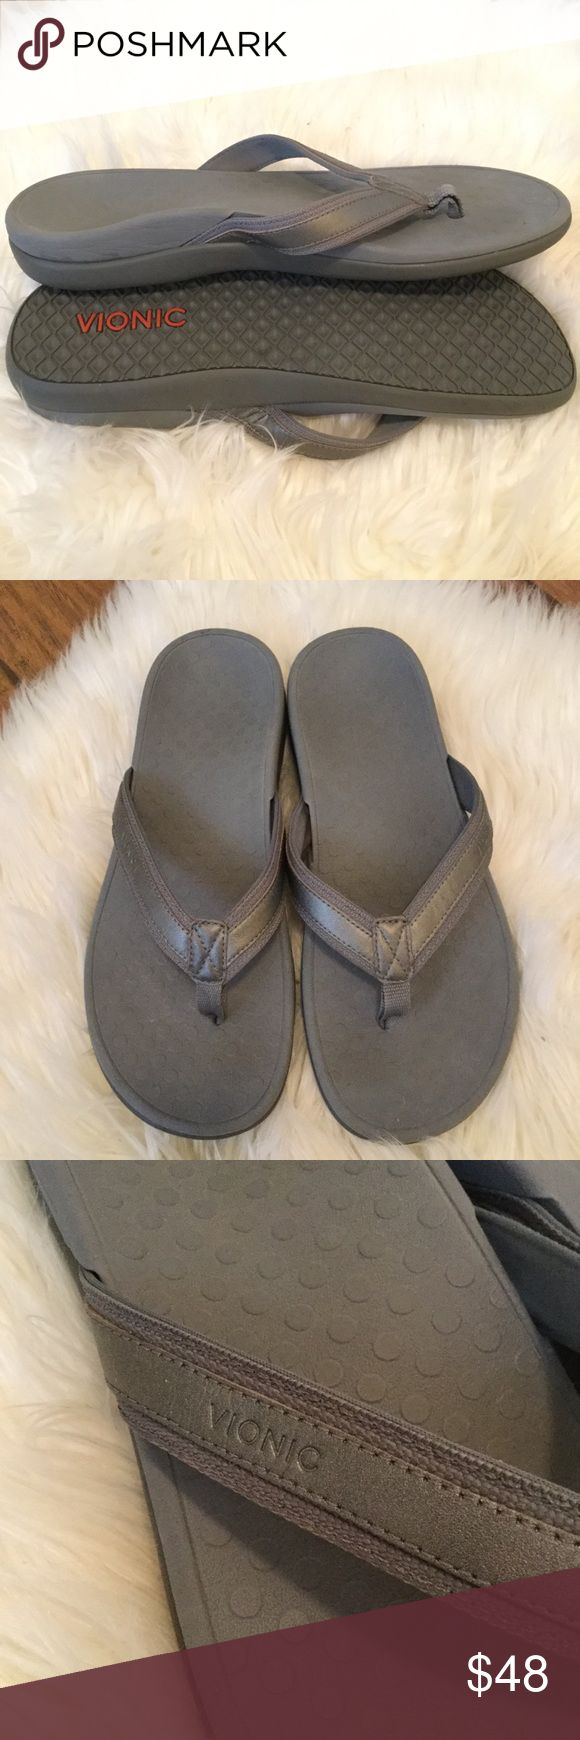 VIONIC Orthaheel Tide lll Grey Flip Flop Sandals VIONIC Orthaheel Tide lll Grey Flip Flop Sandals  Size 10 Vionic Shoes Sandals